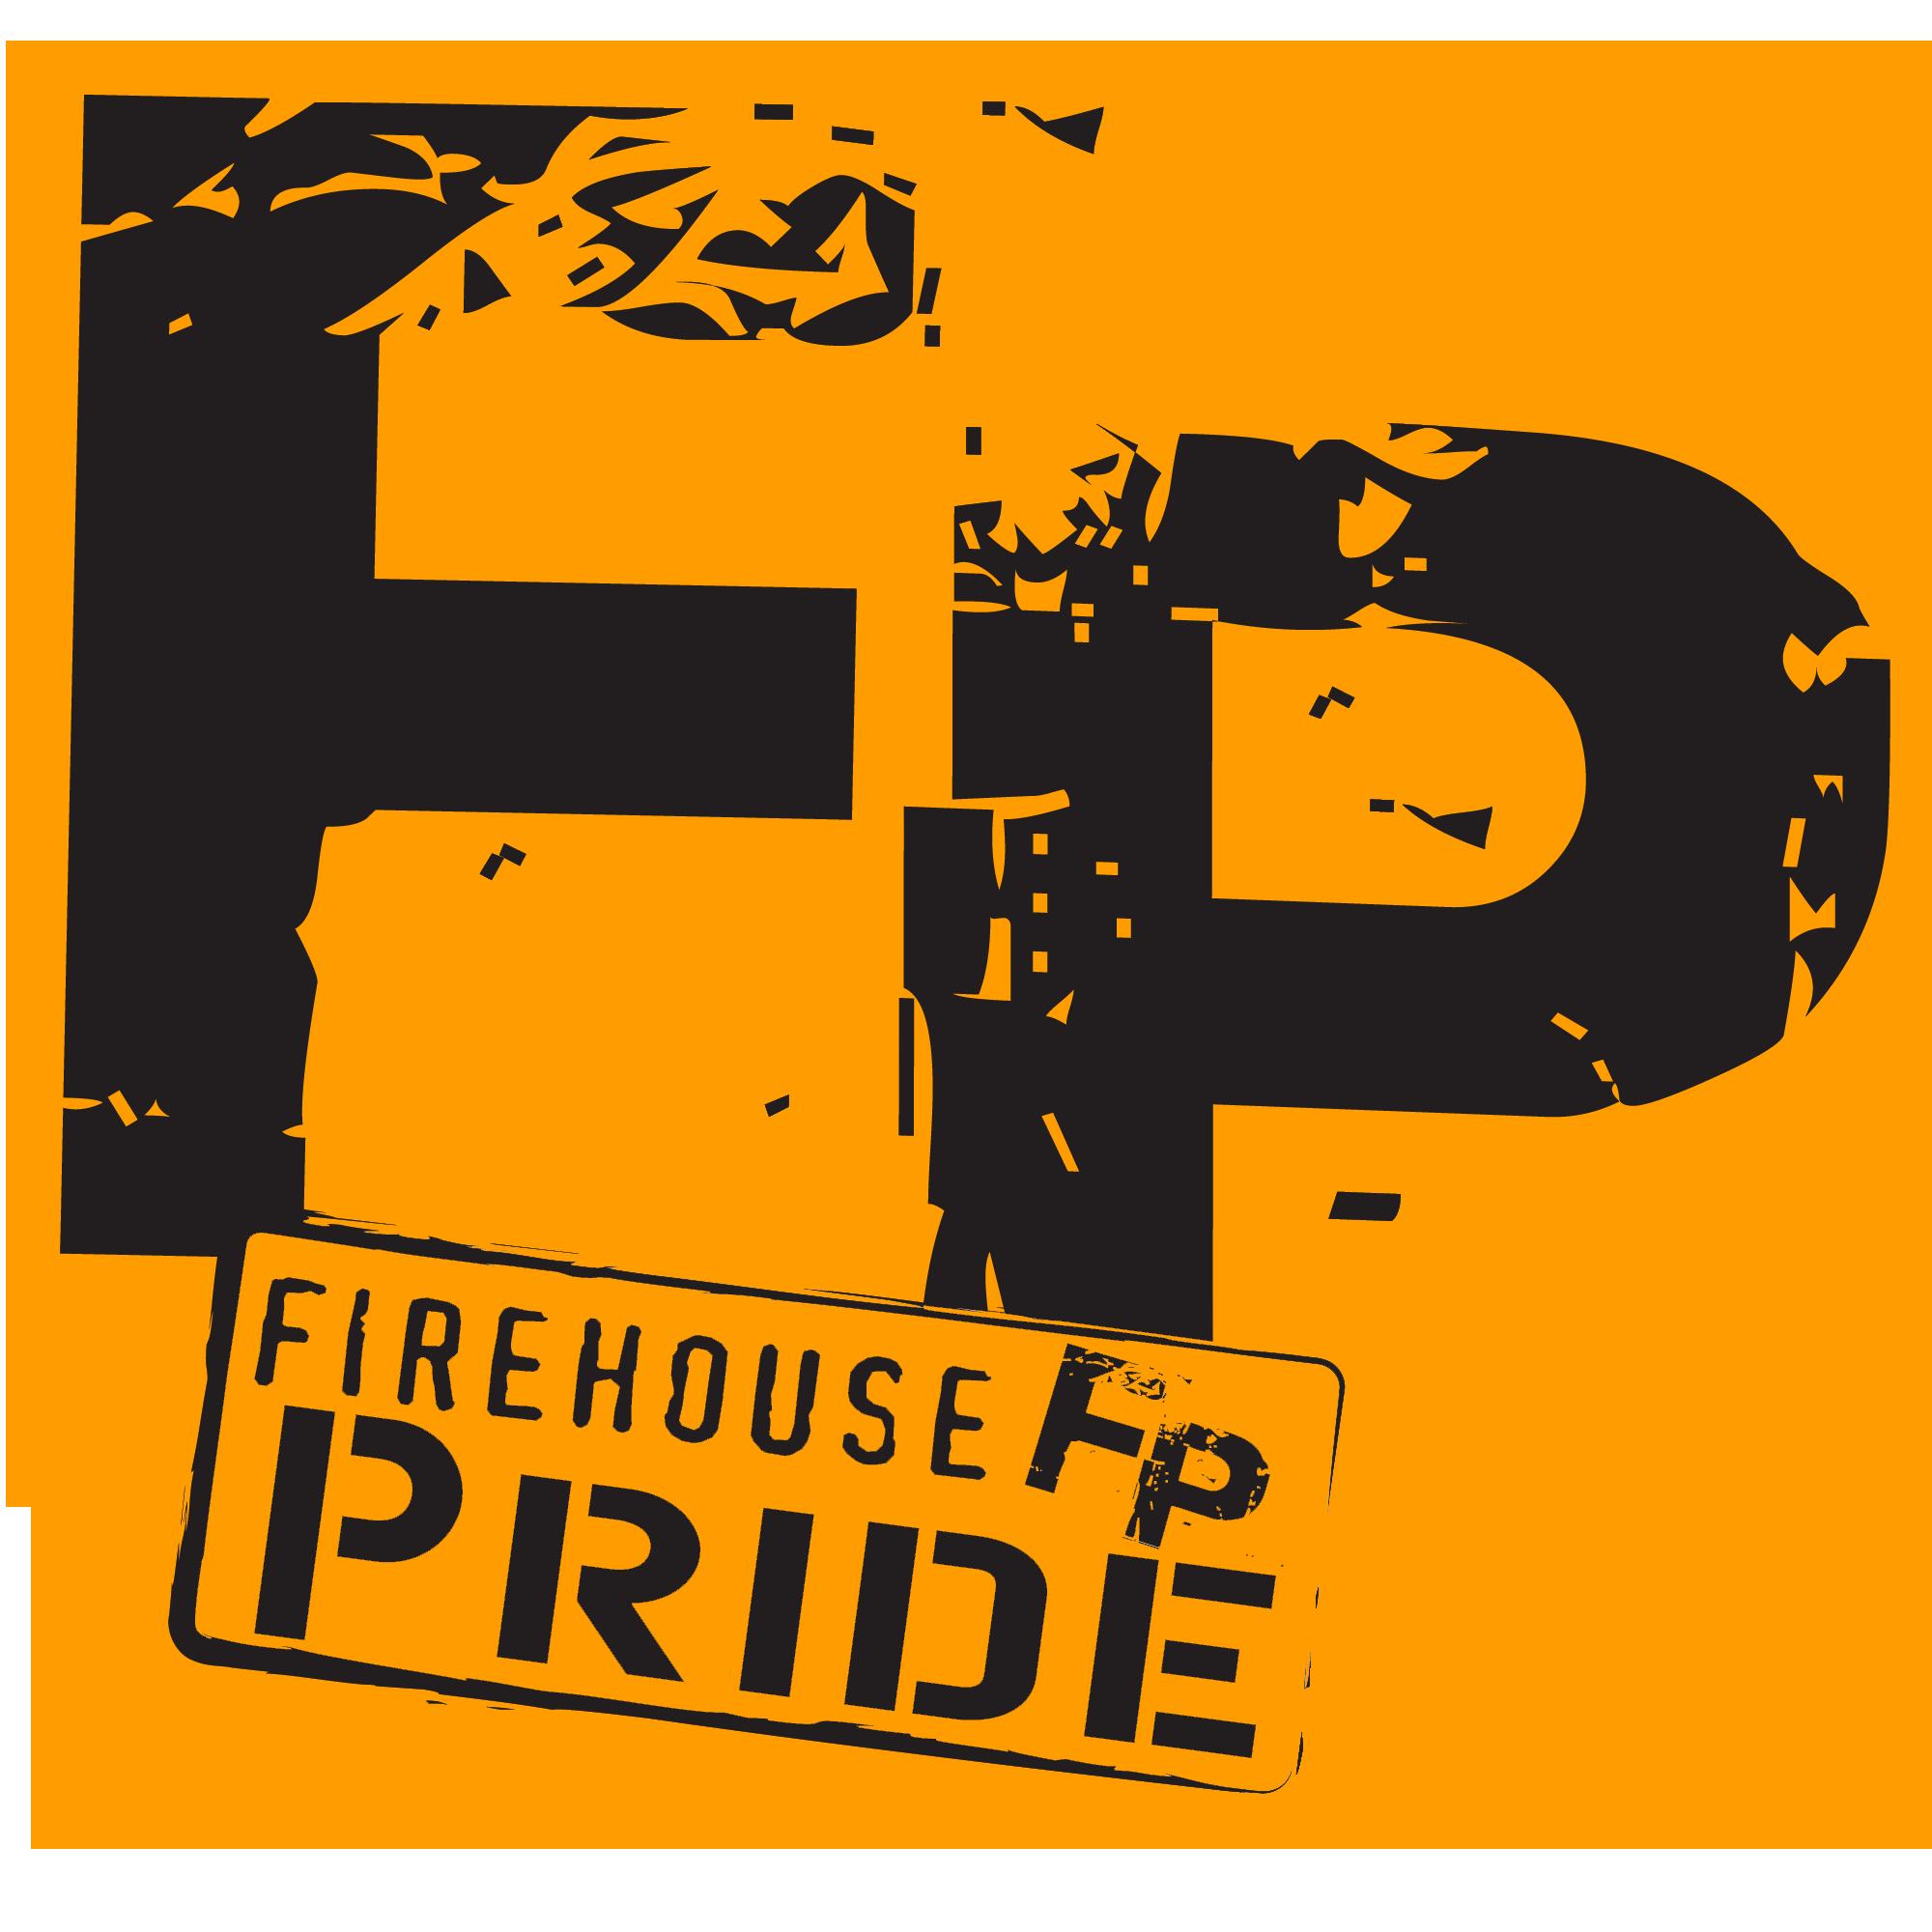 Firefighter clipart halligan bar. Tool pride the world